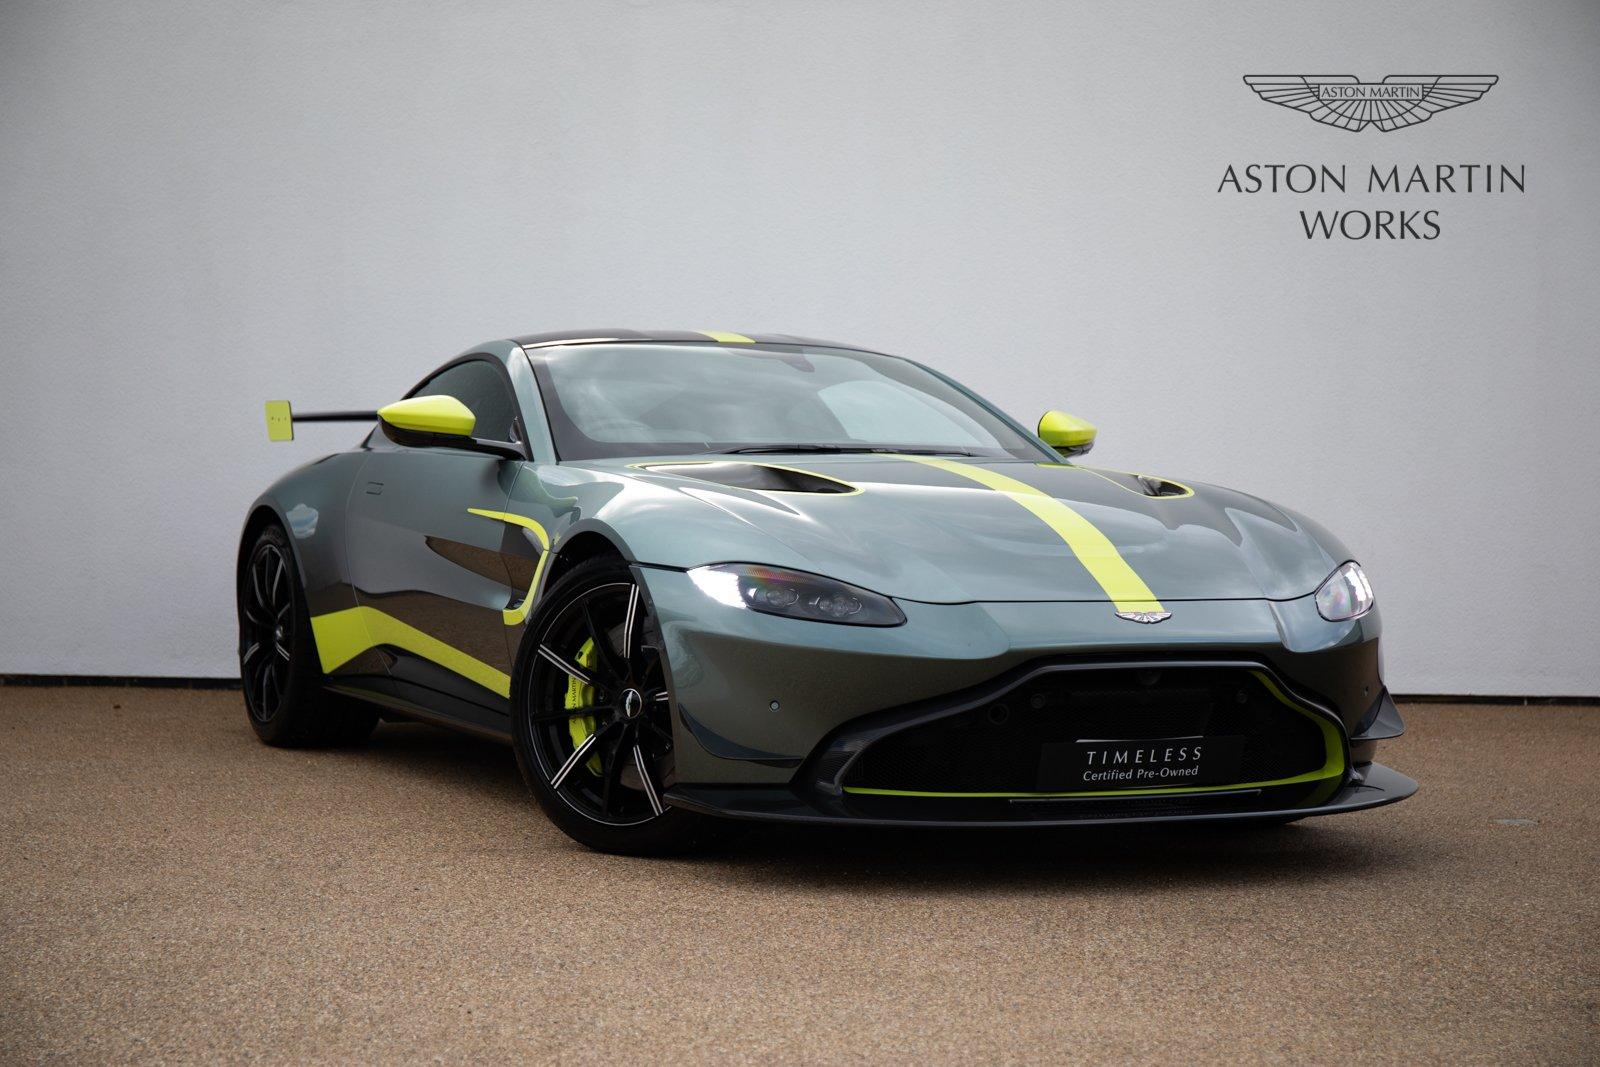 2019 Aston Martin V8 Vantage 1 Of 3 Ceo Edition Classic Driver Market